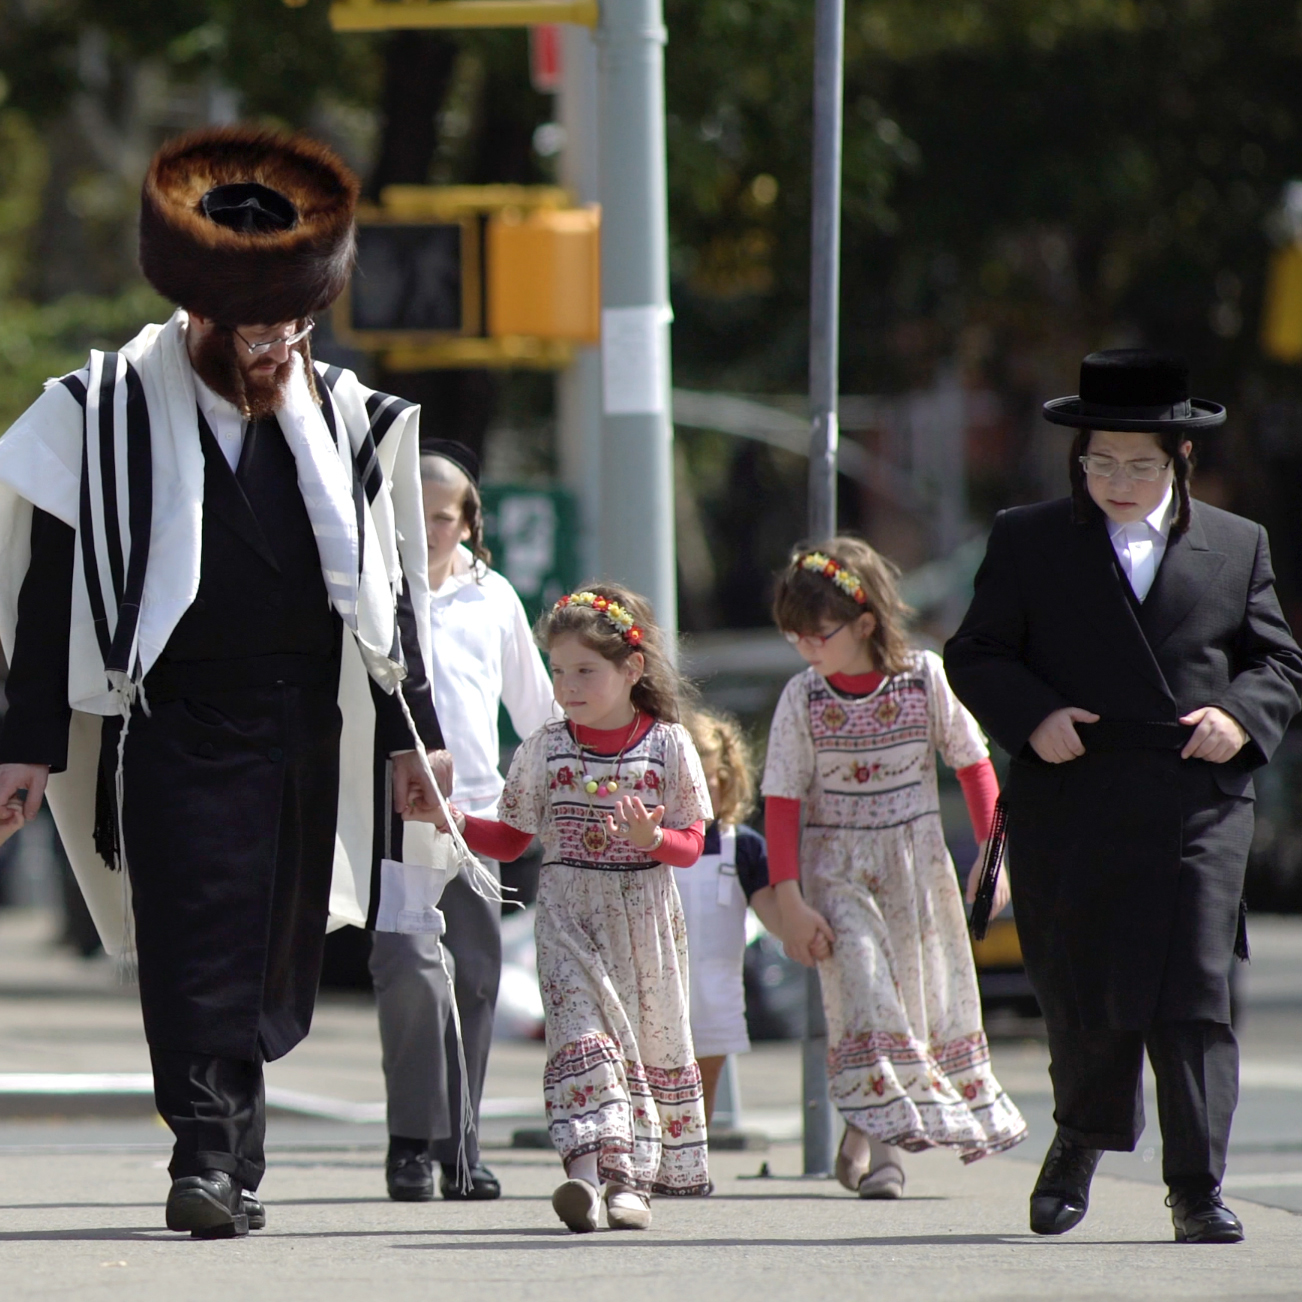 Еврейский район - Хасиды, Кошерный Бруклин